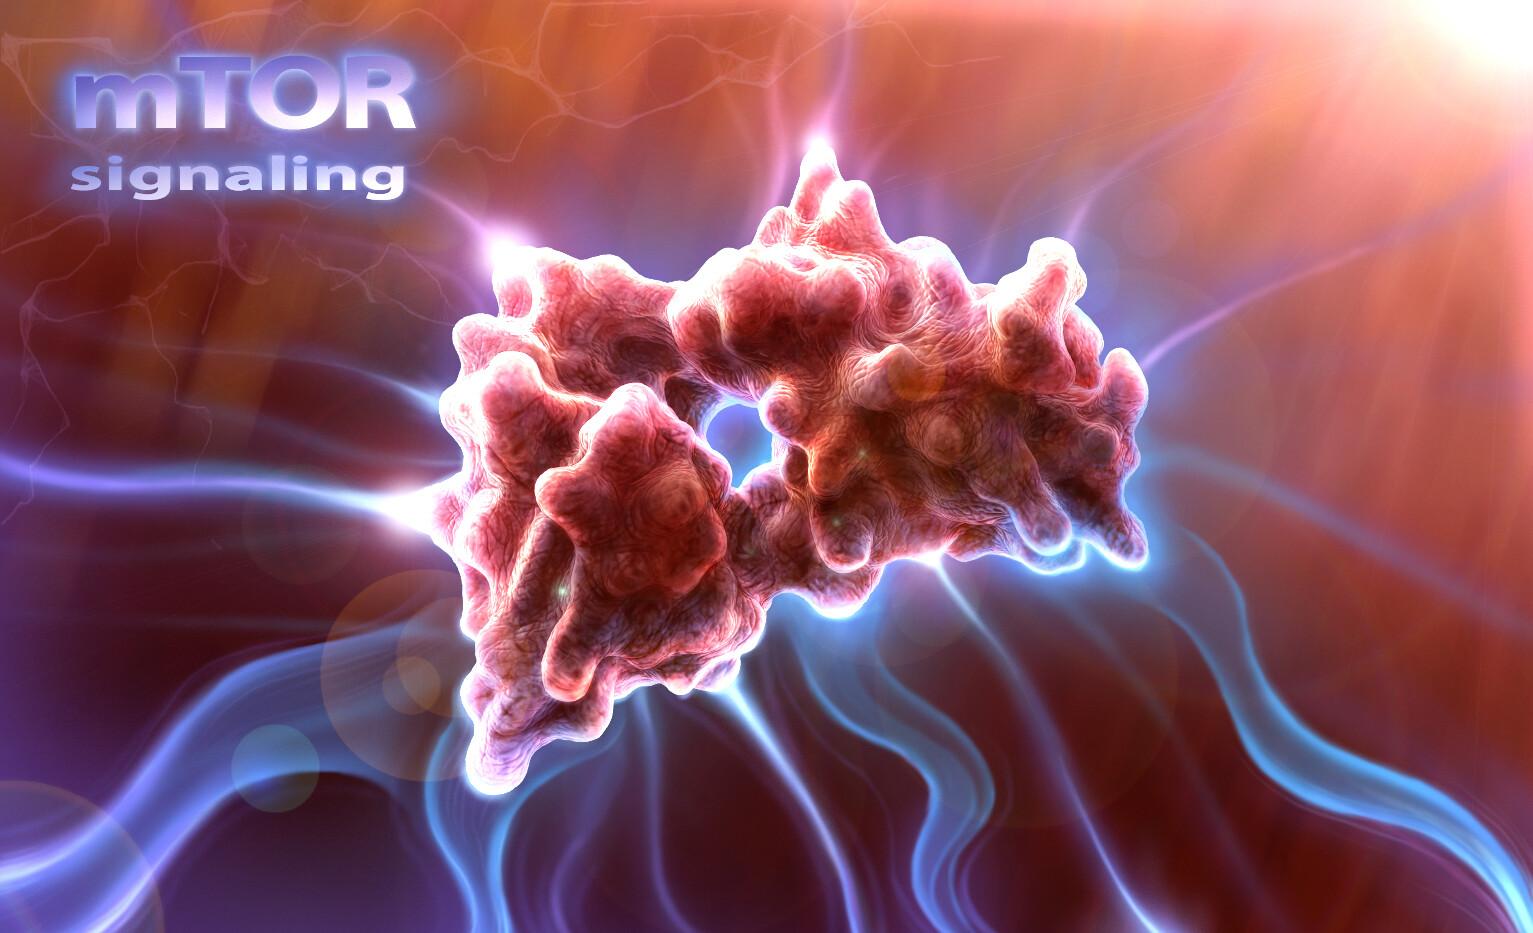 mTor Signaling: cancer pathway